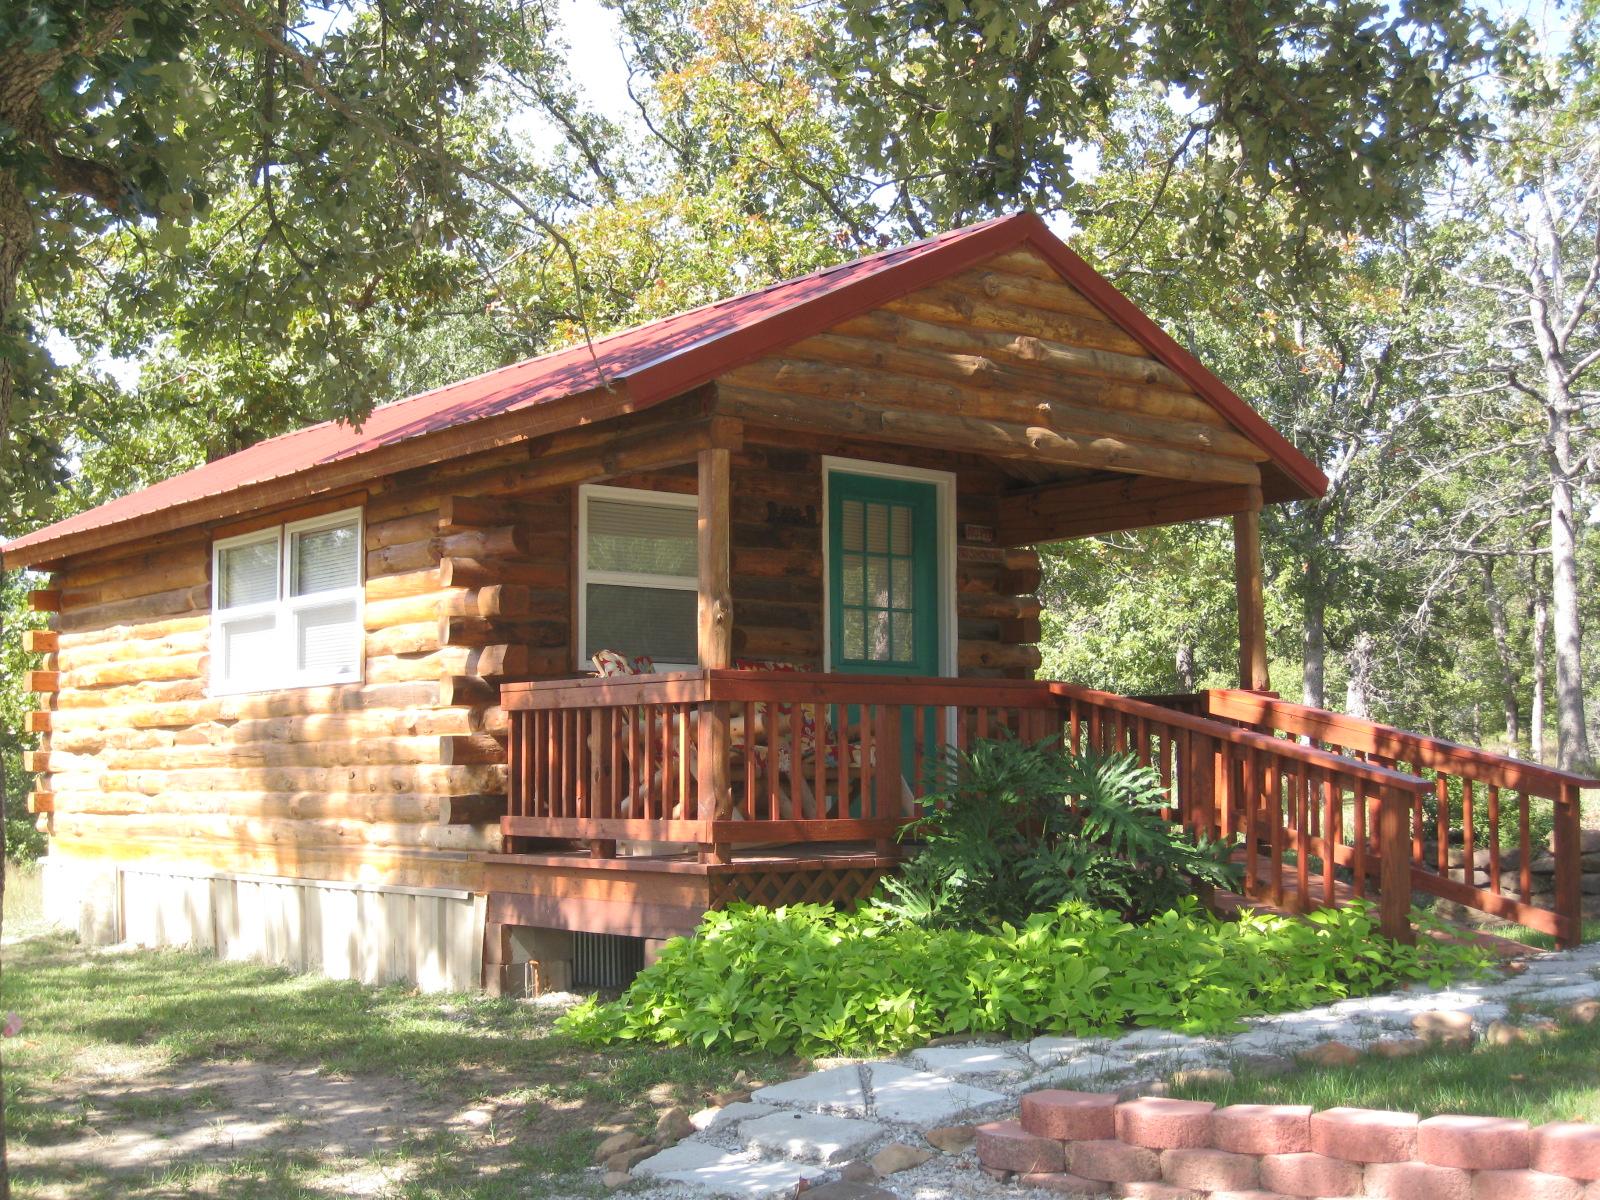 El dorado springs rv parks reviews and photos for El dorado cabins